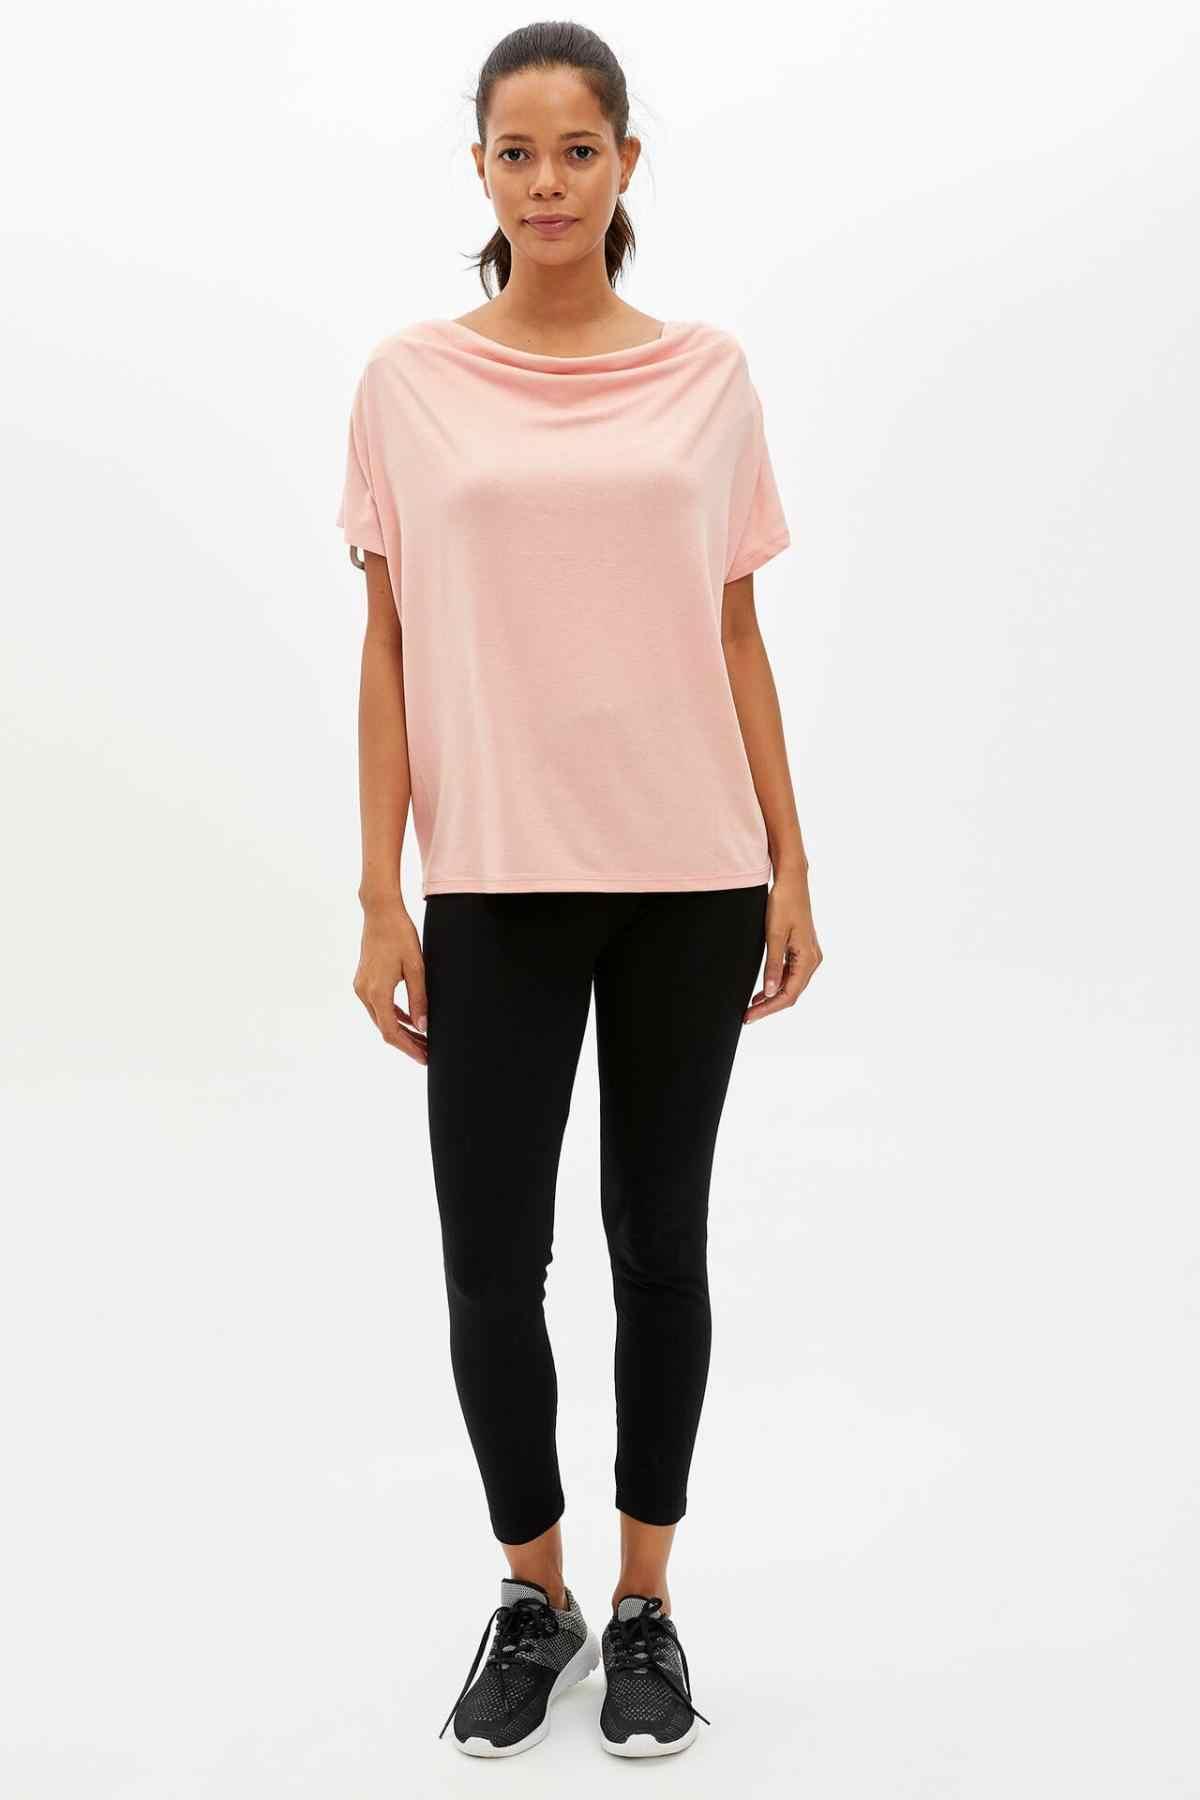 DeFacto Vrouwen Mode Crewneck Tops Vrouwelijke Toevallige Losse Roze Mouw Dames Elegante T-Shirt Zomer Nieuwe-M4311AZ19AU